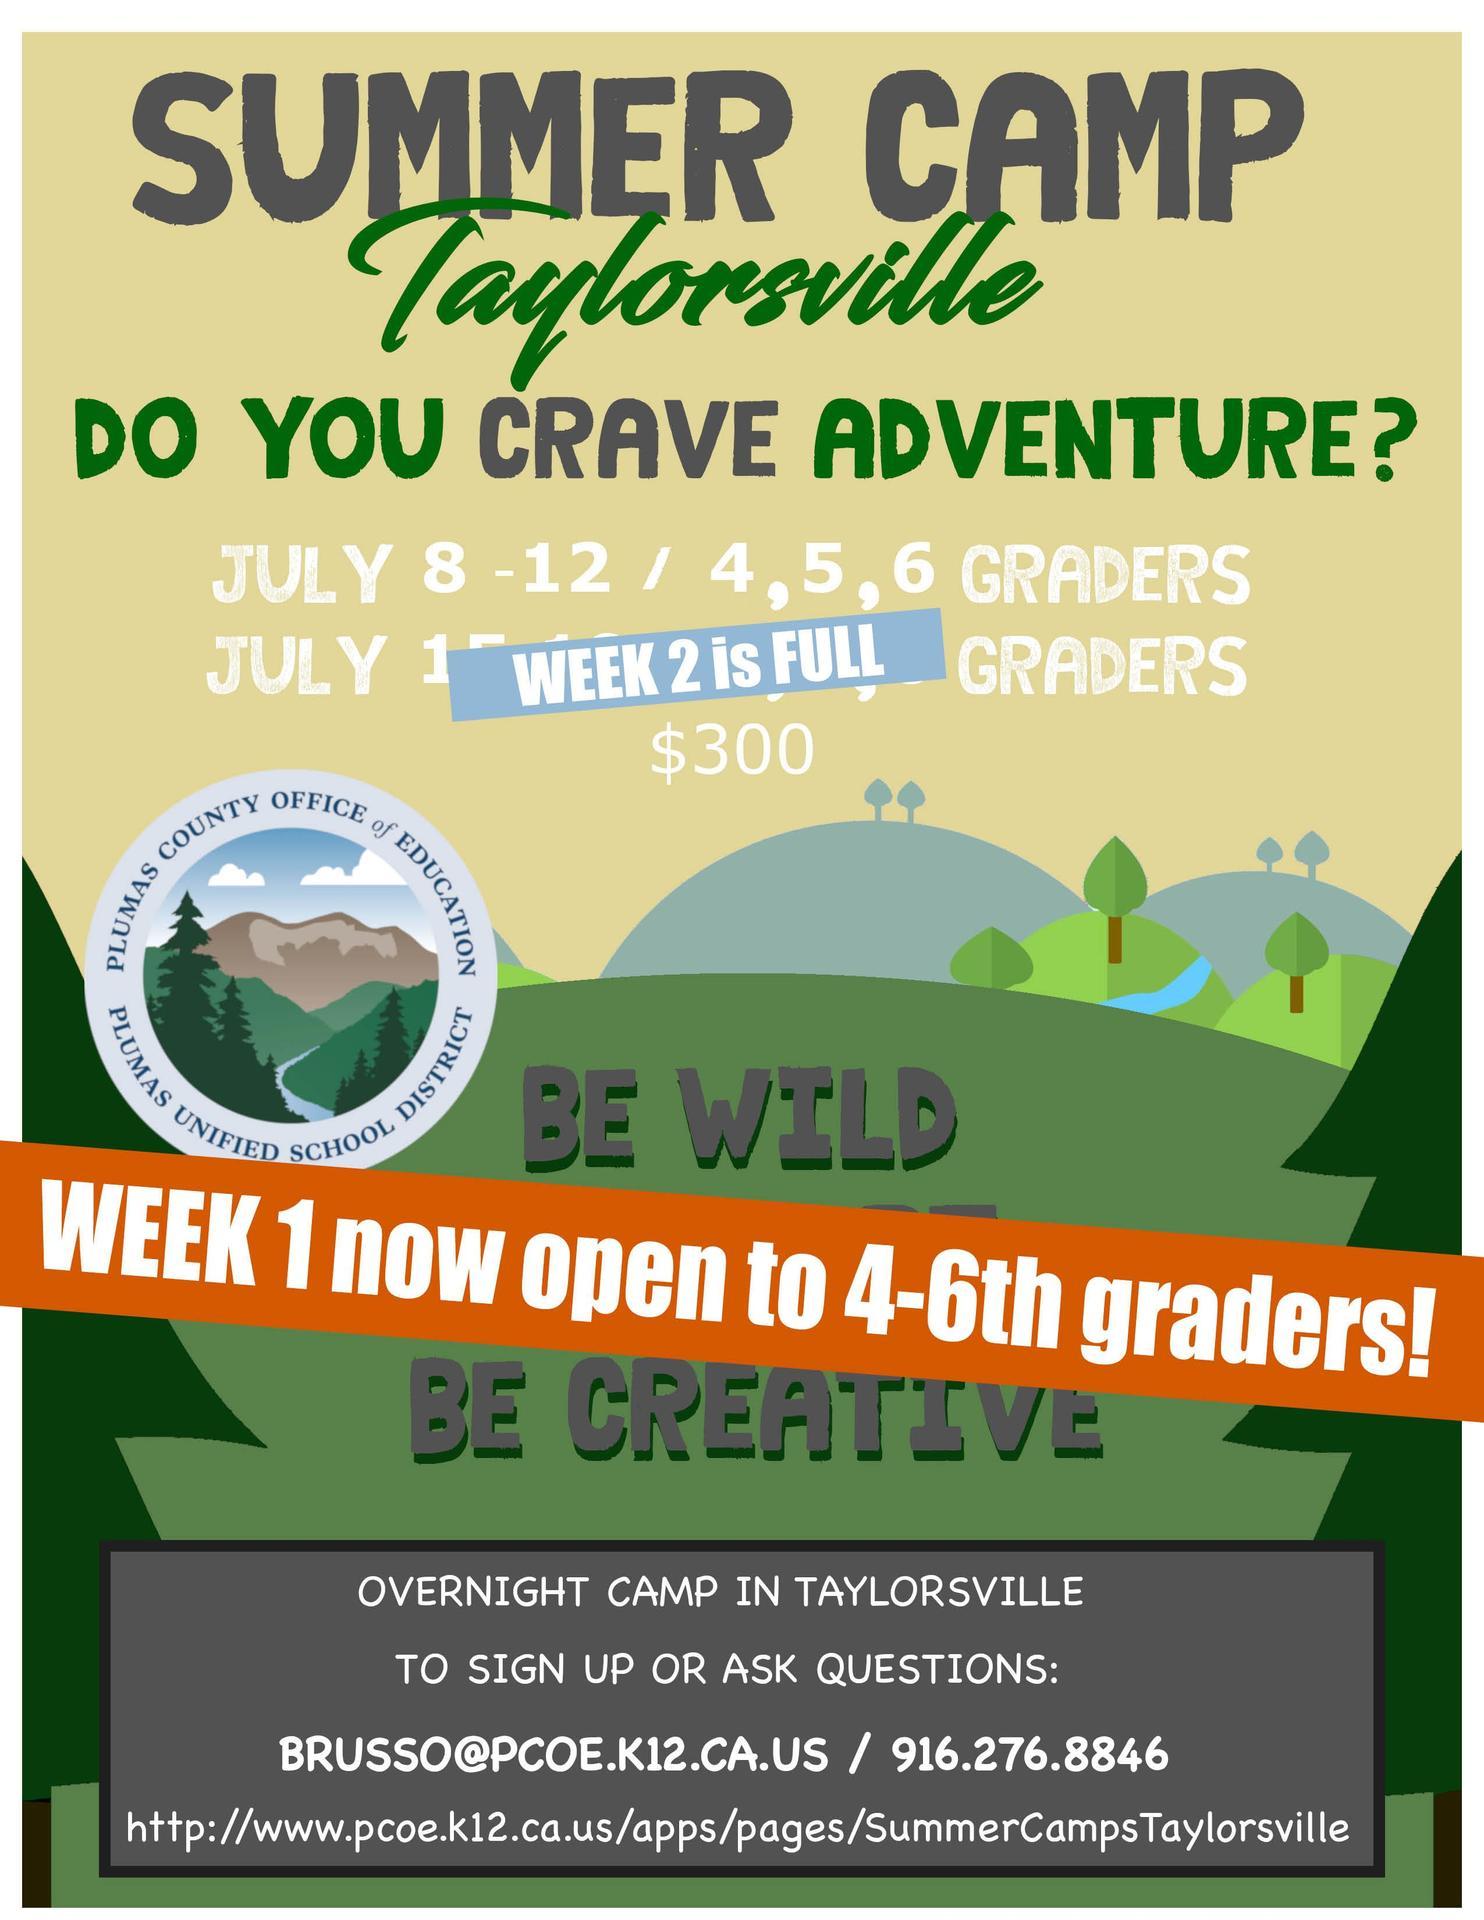 Updated Camp Taylorsville Flyer